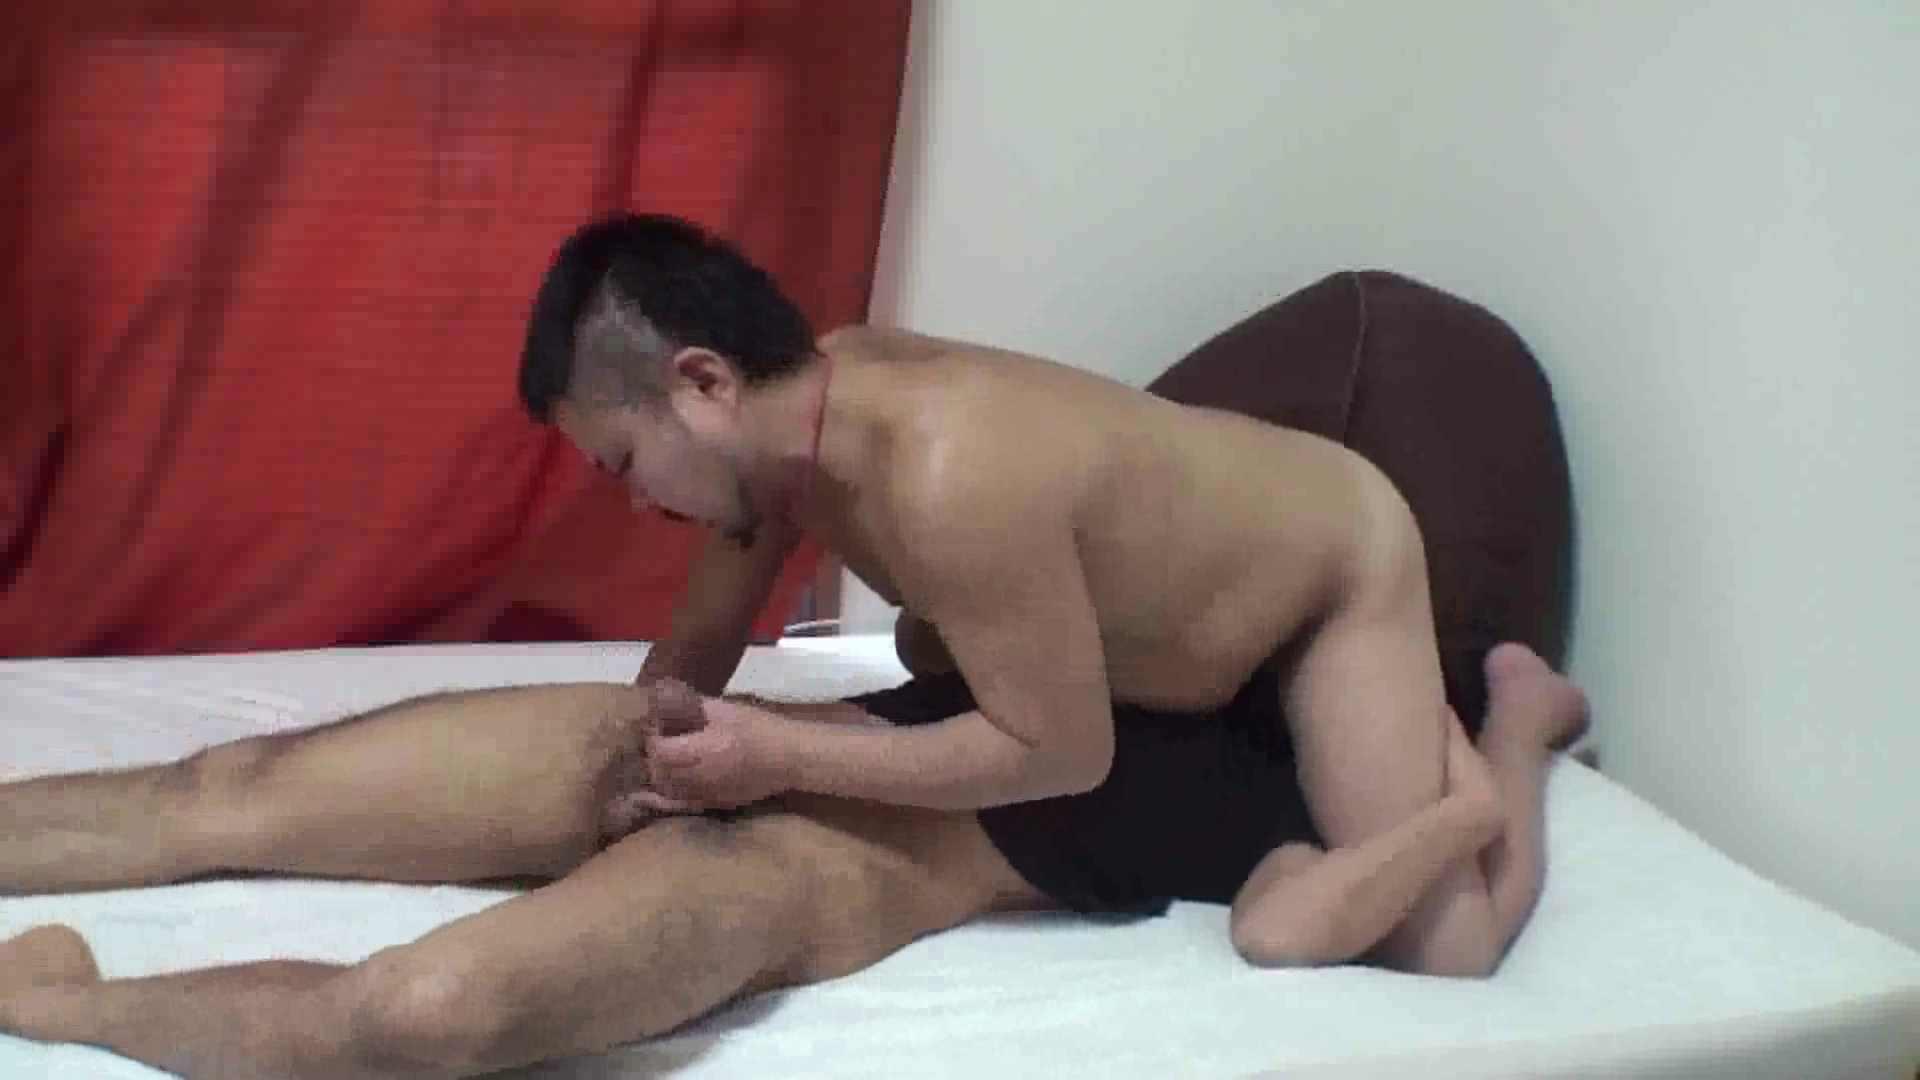 HD 良太と健二当たり前の日常 セックス編 VOL.02 スジ筋系男子 ゲイえろ動画紹介 104枚 16